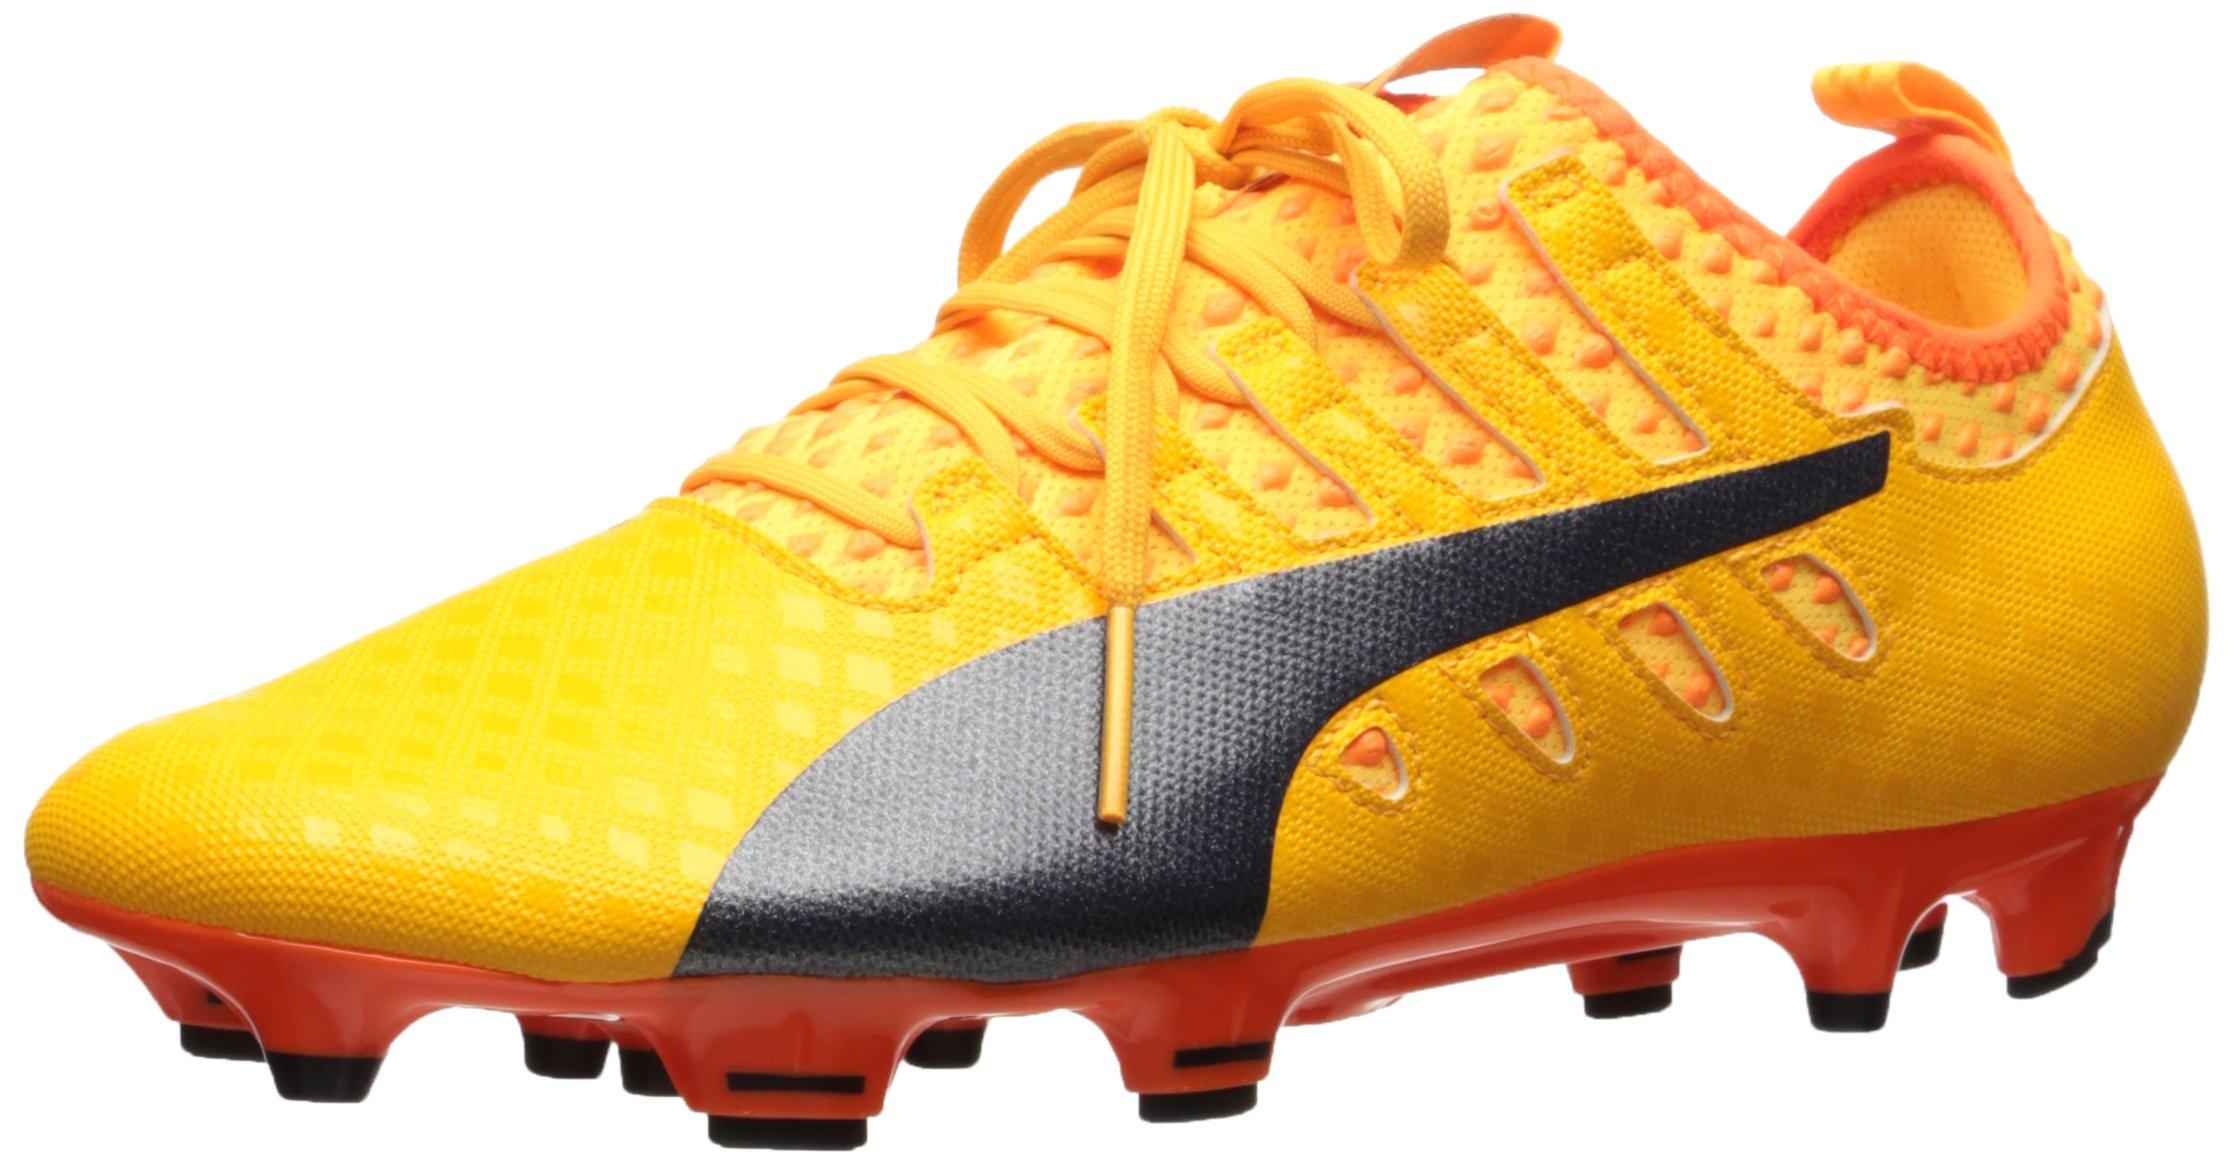 PUMA Men's Evopower Vigor 2 FG Soccer Shoe, Ultra Yellow-Peacoat-Orange Clown Fish, 9 M US